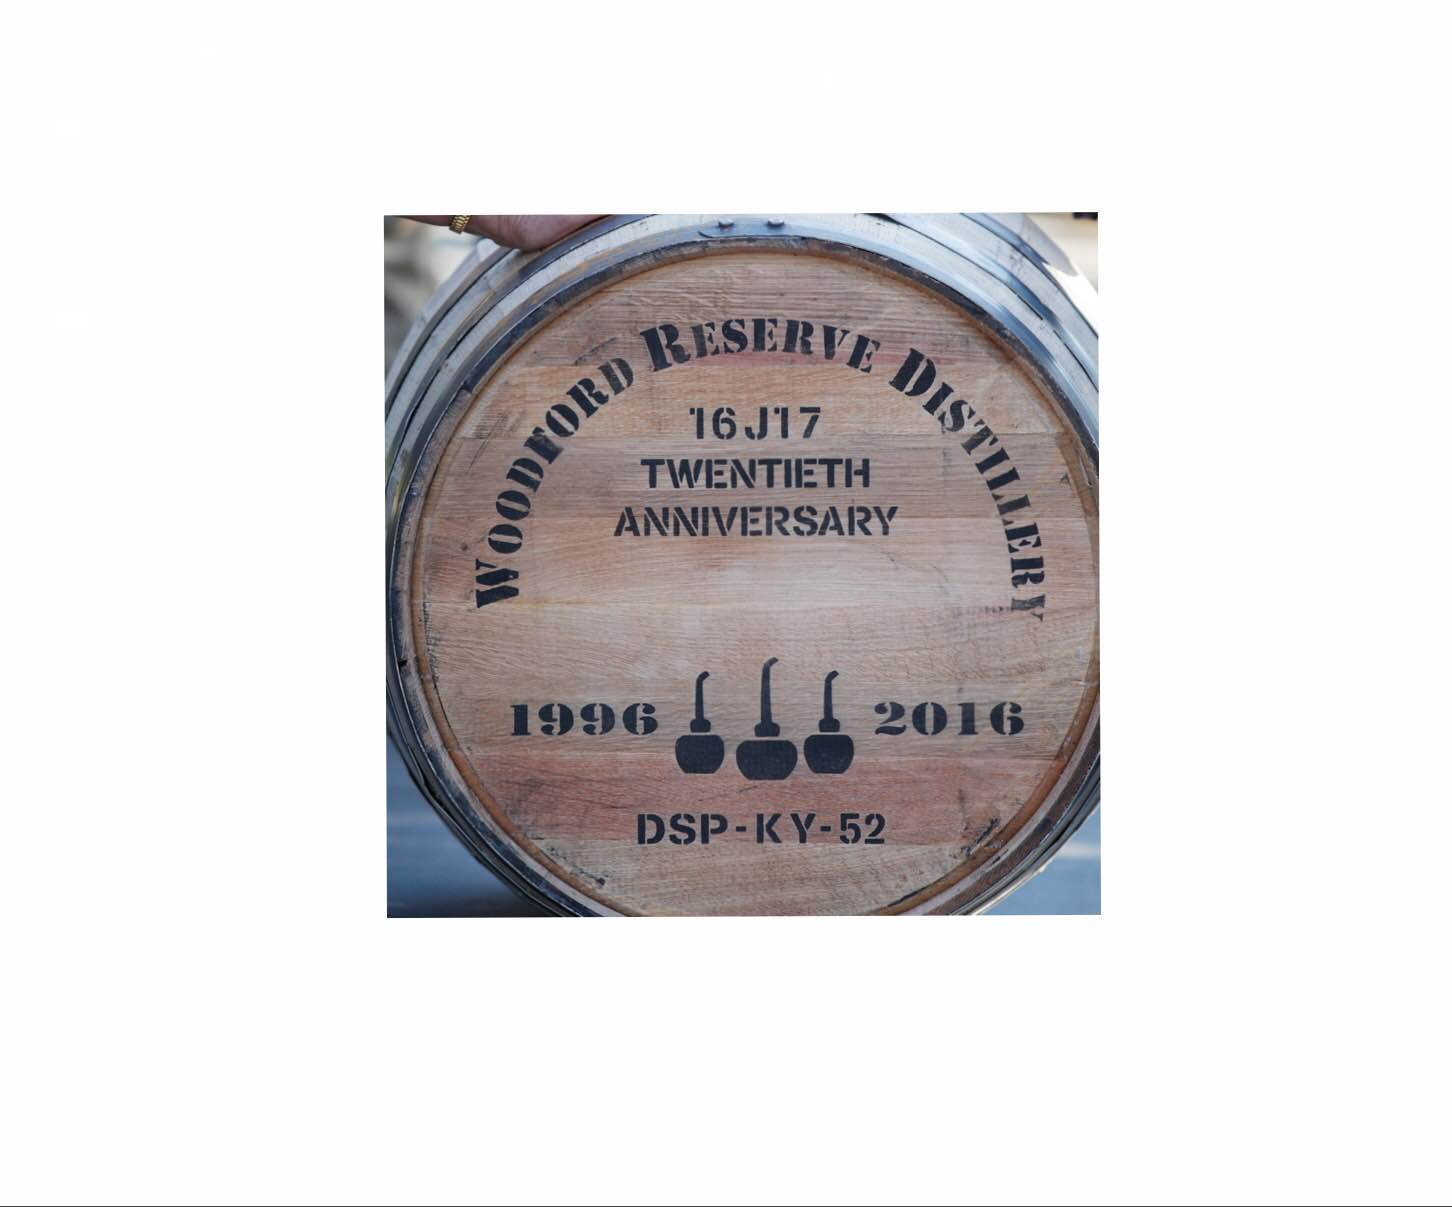 70e65b3d56 Woodford Reserve Celebrates 20th Anniversary - The Bourbon Review